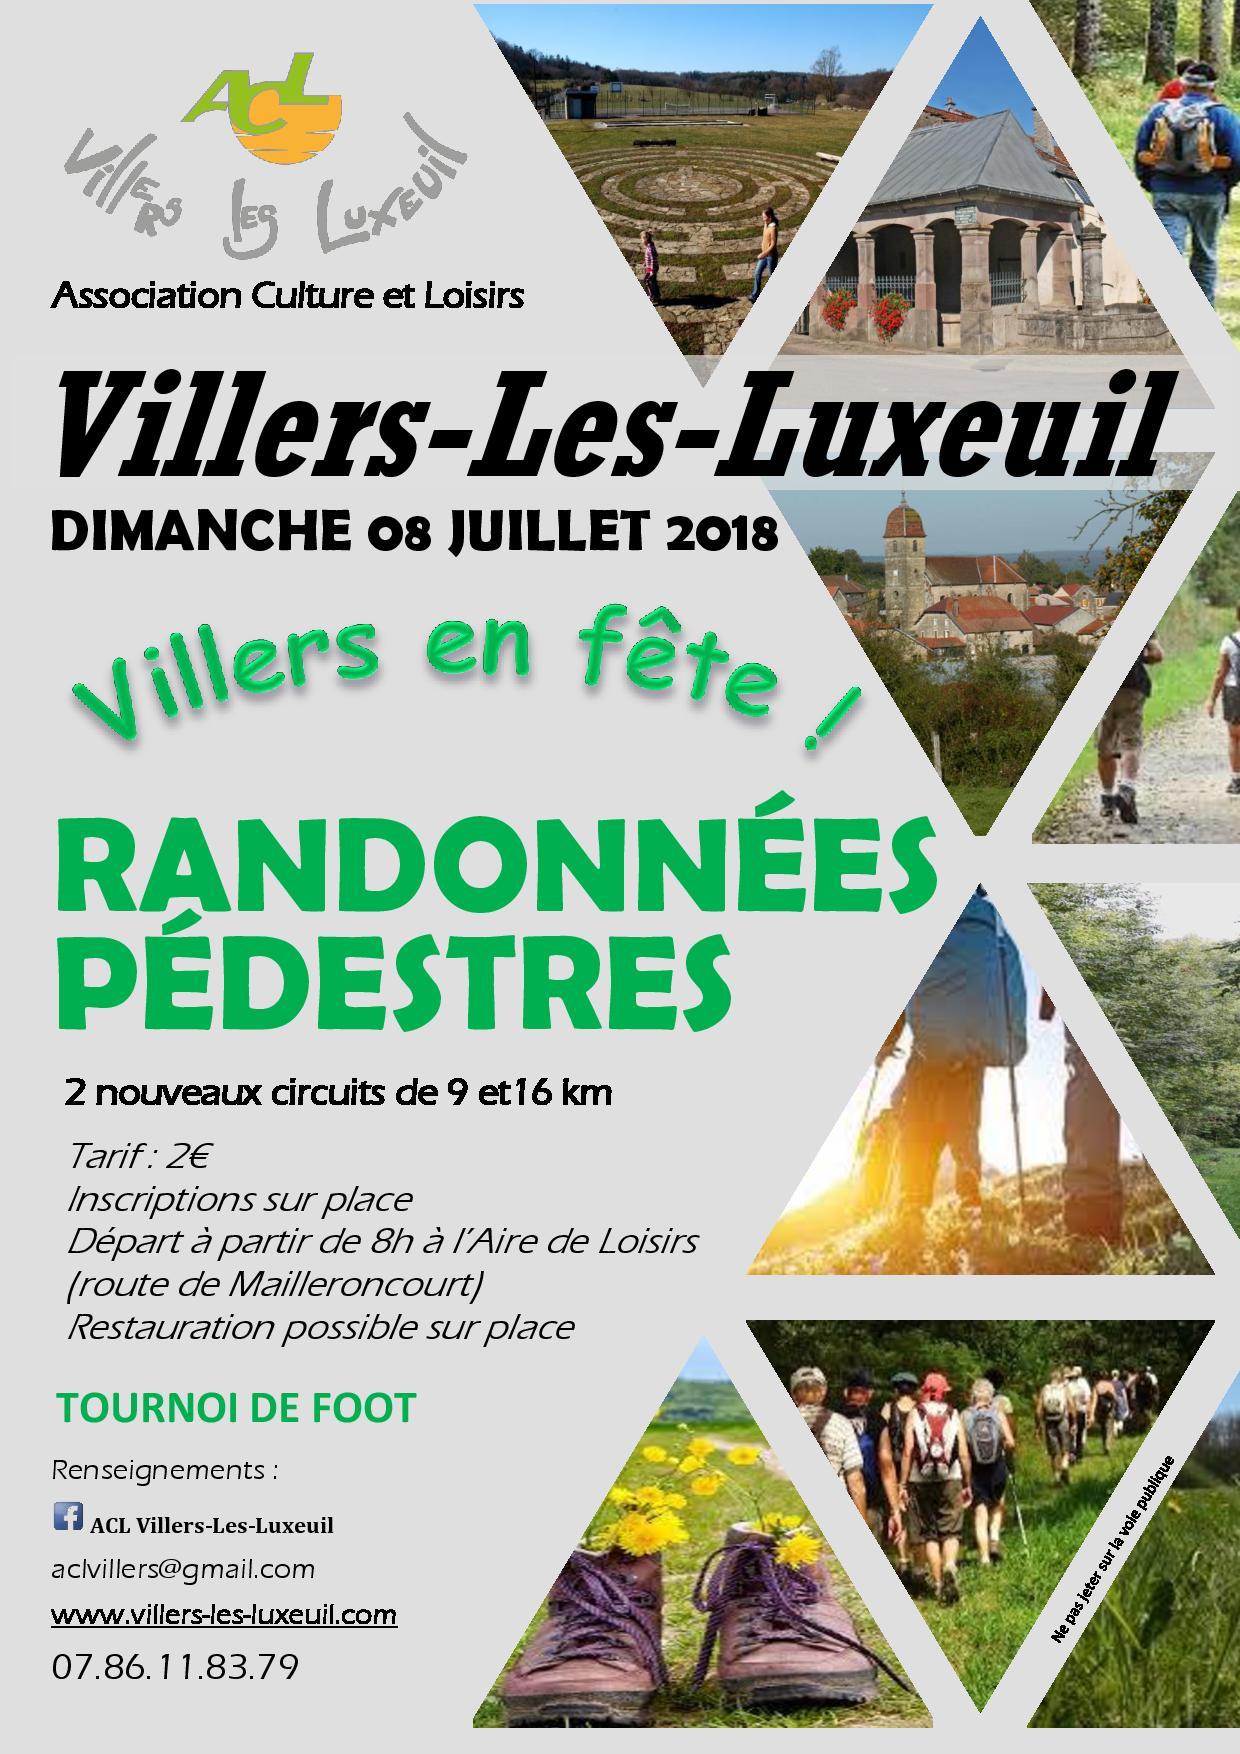 https://www.villers-les-luxeuil.com/projets/villers/files/images/2018_Flyers_Tracts/2018_07_08_Villers_En_Fete.jpg